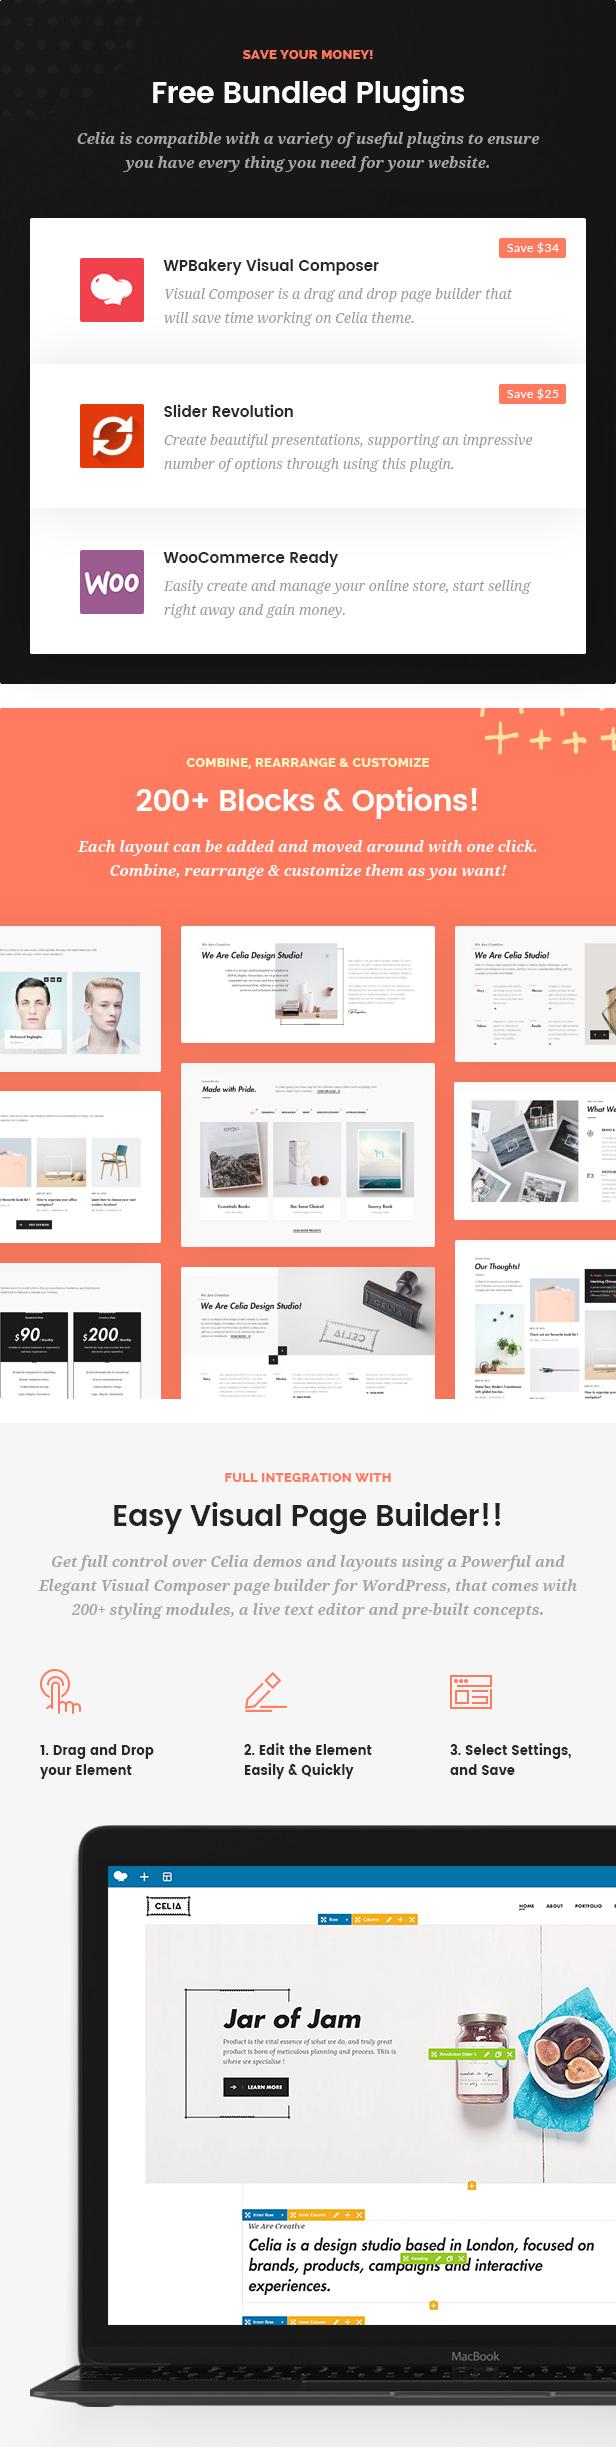 Celia - Innovative and Inspiring Portfolio WordPress Theme for Modern Agencies and Freelancers - 5